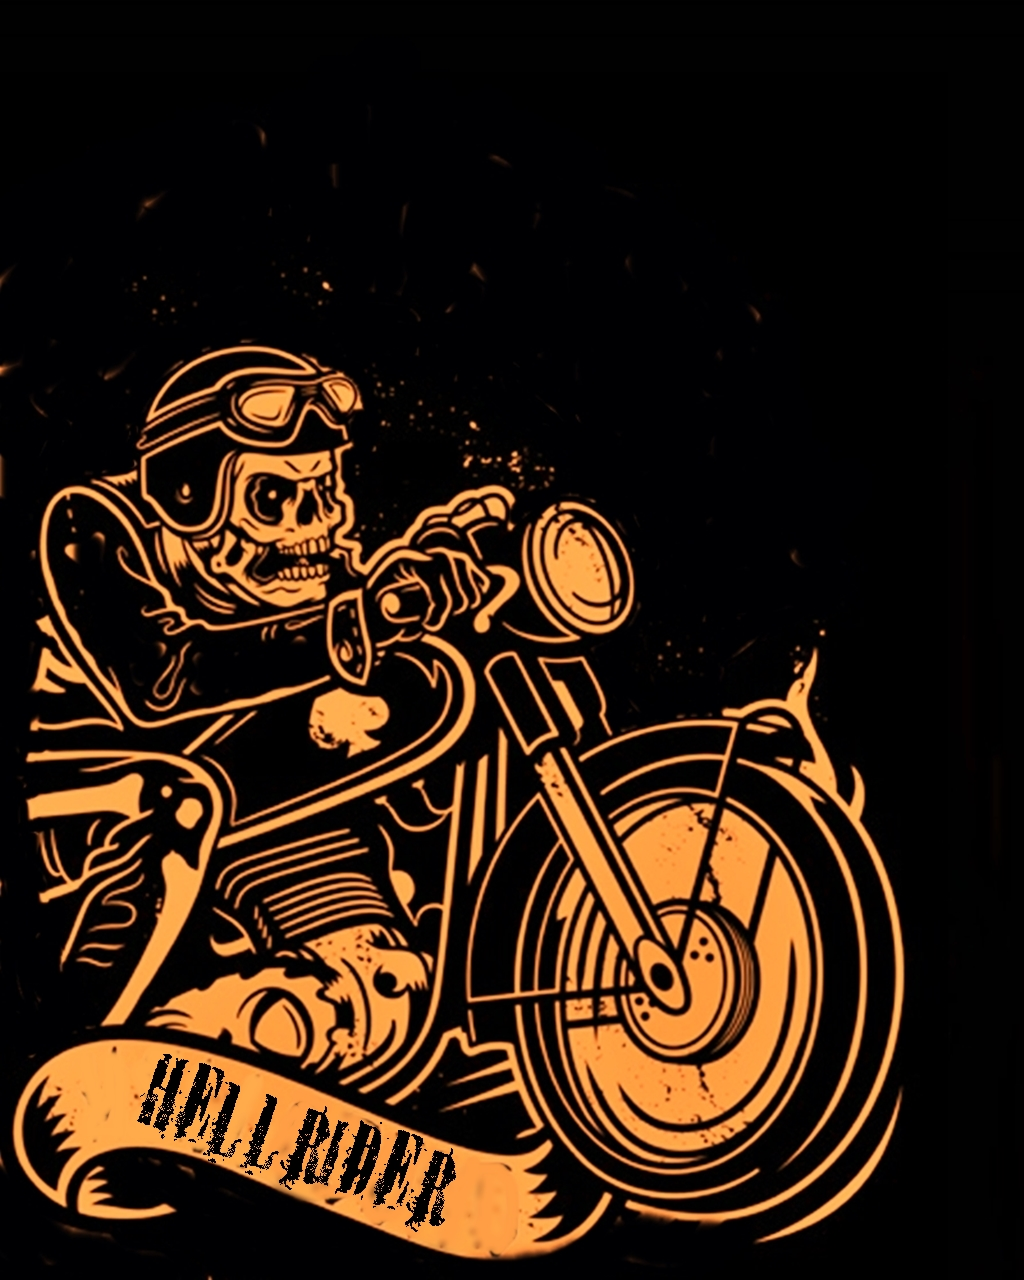 Poster Art Hot Rod Rockabilly By Pave65 On Deviantart